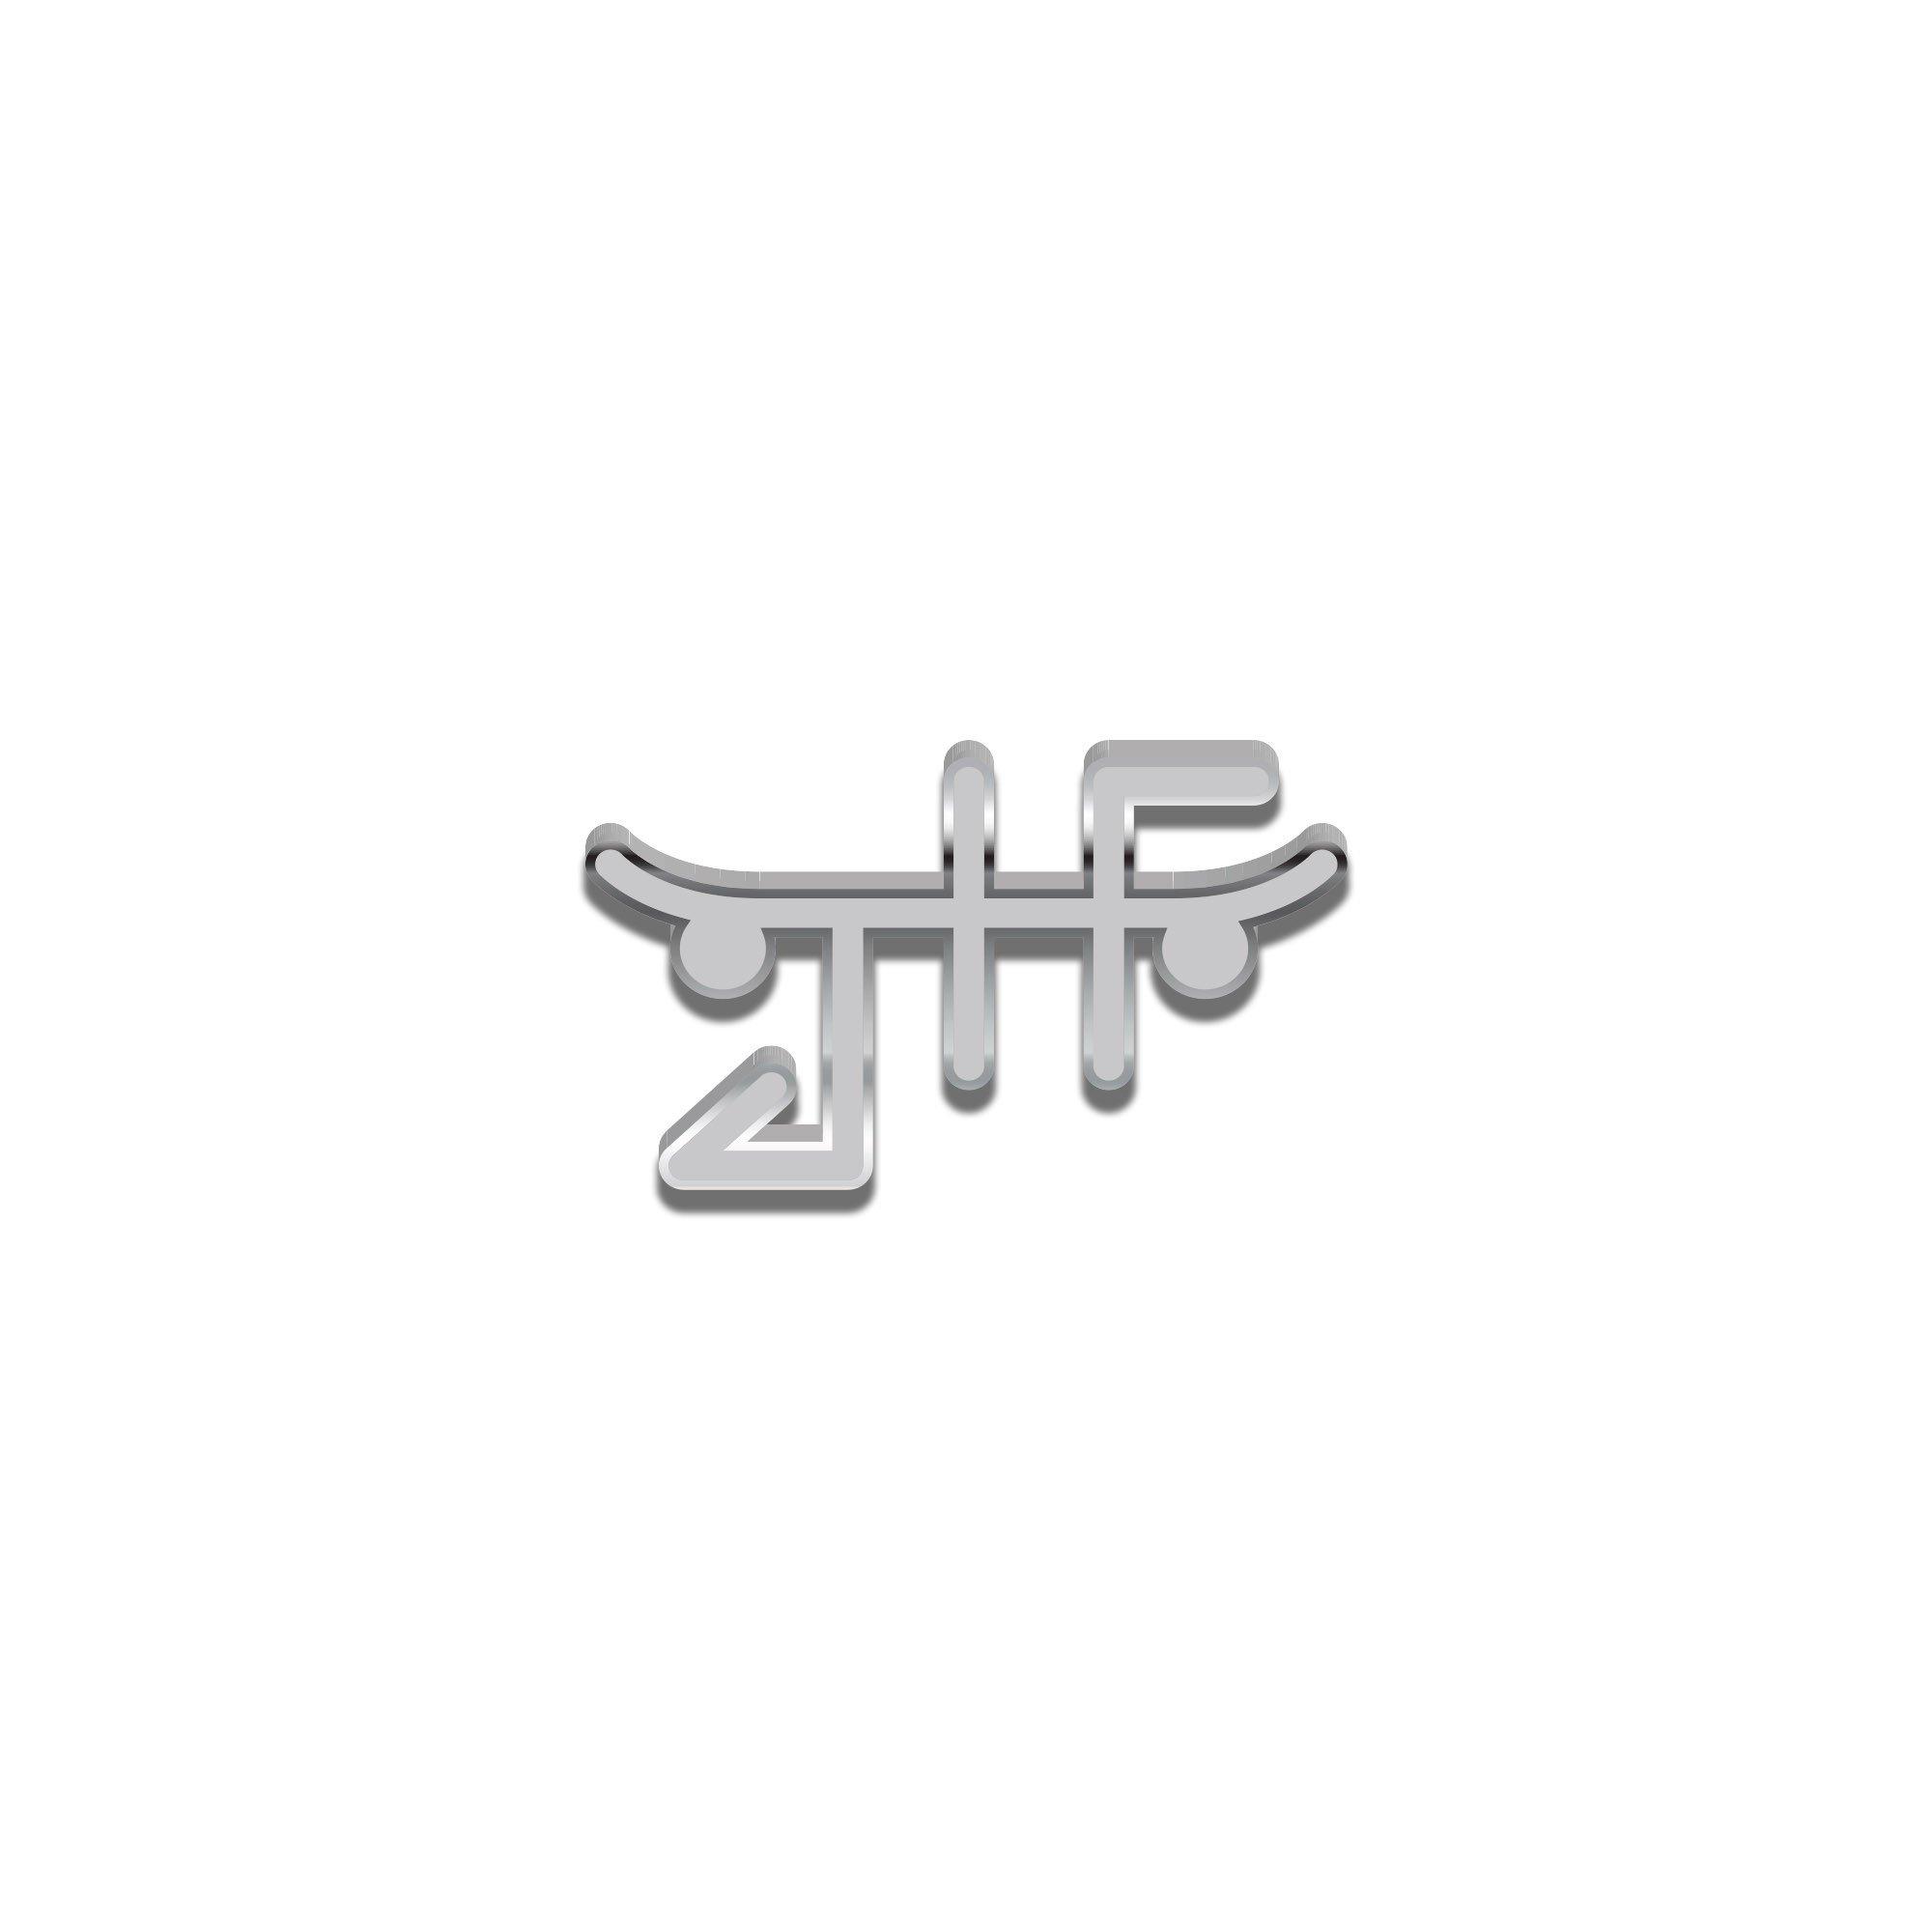 【JUST HAVE FUN/ジャストハブファン】JHF LOGO PIN ピンバッチ / SILVER